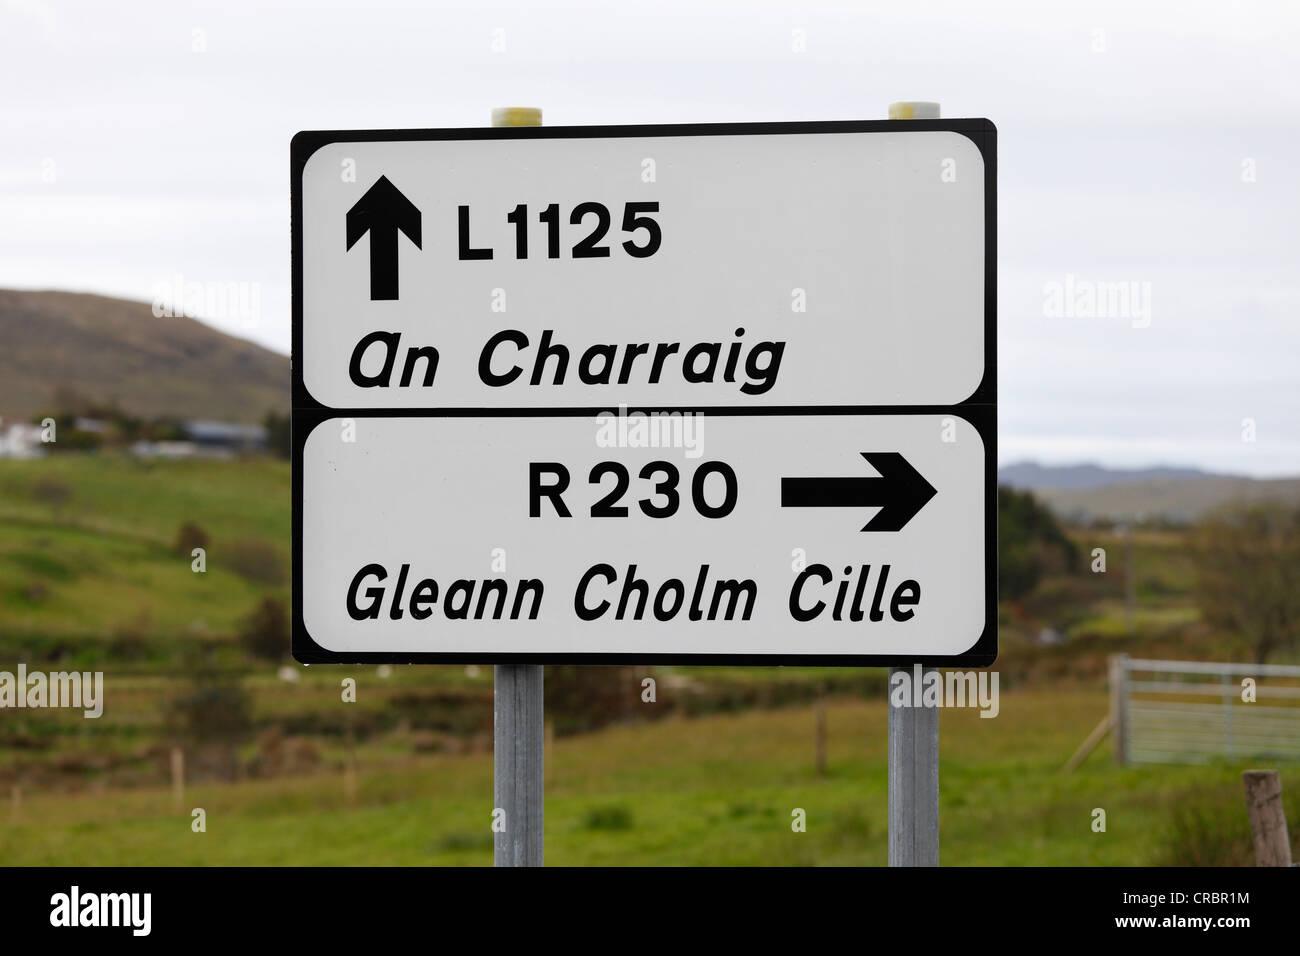 Sign in Irish language, Gaelic, Carrick, County Donegal, Ireland, Europe, PublicGround - Stock Image